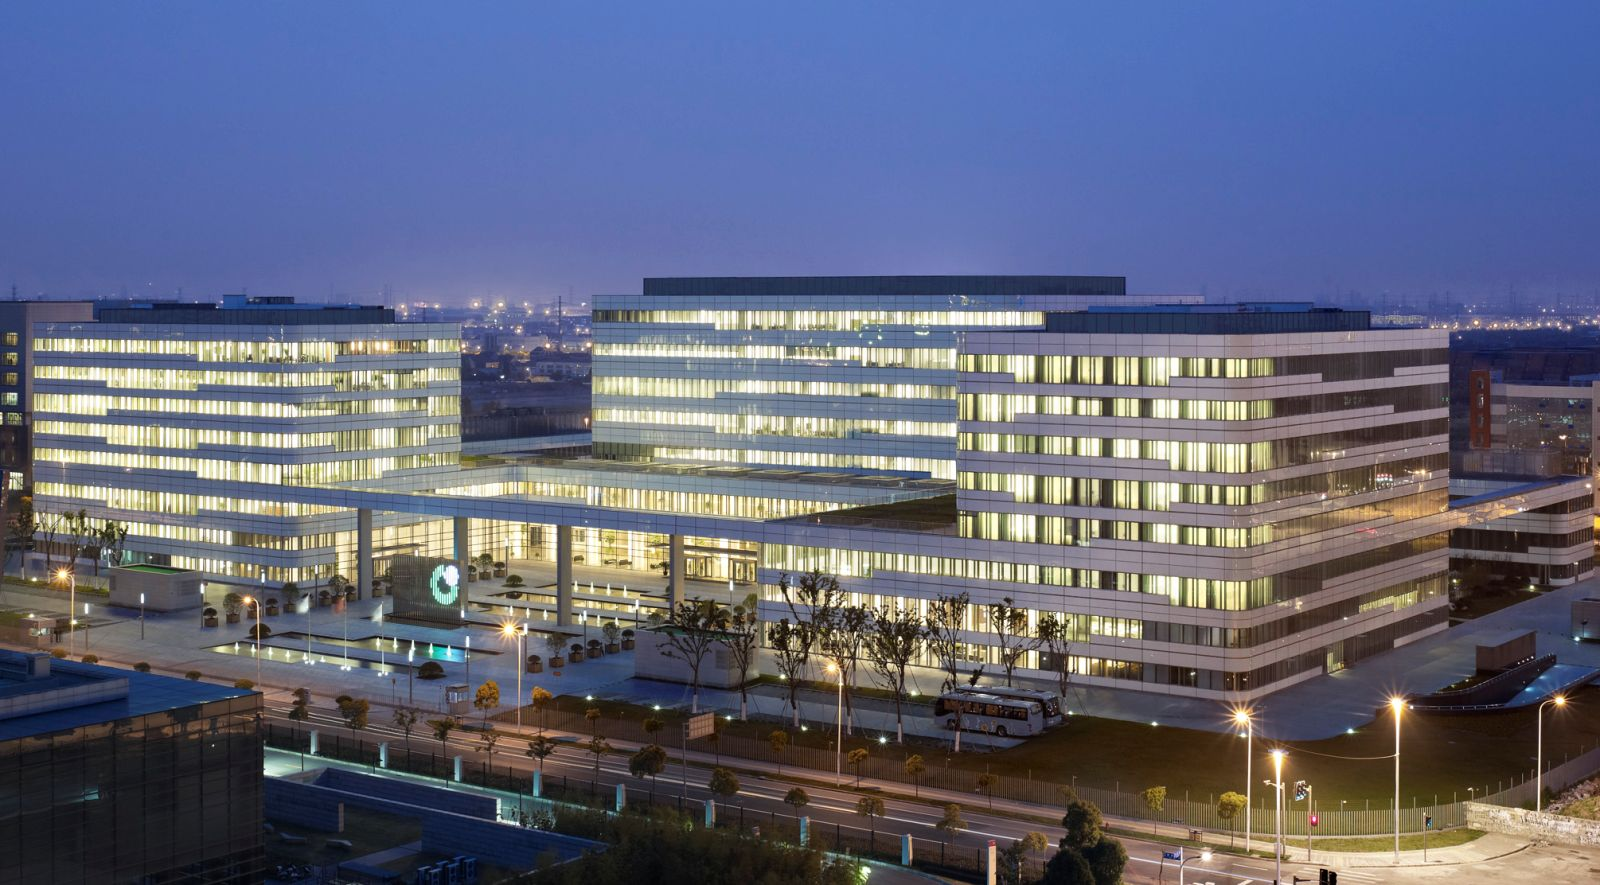 Data Center of China Life Insurance